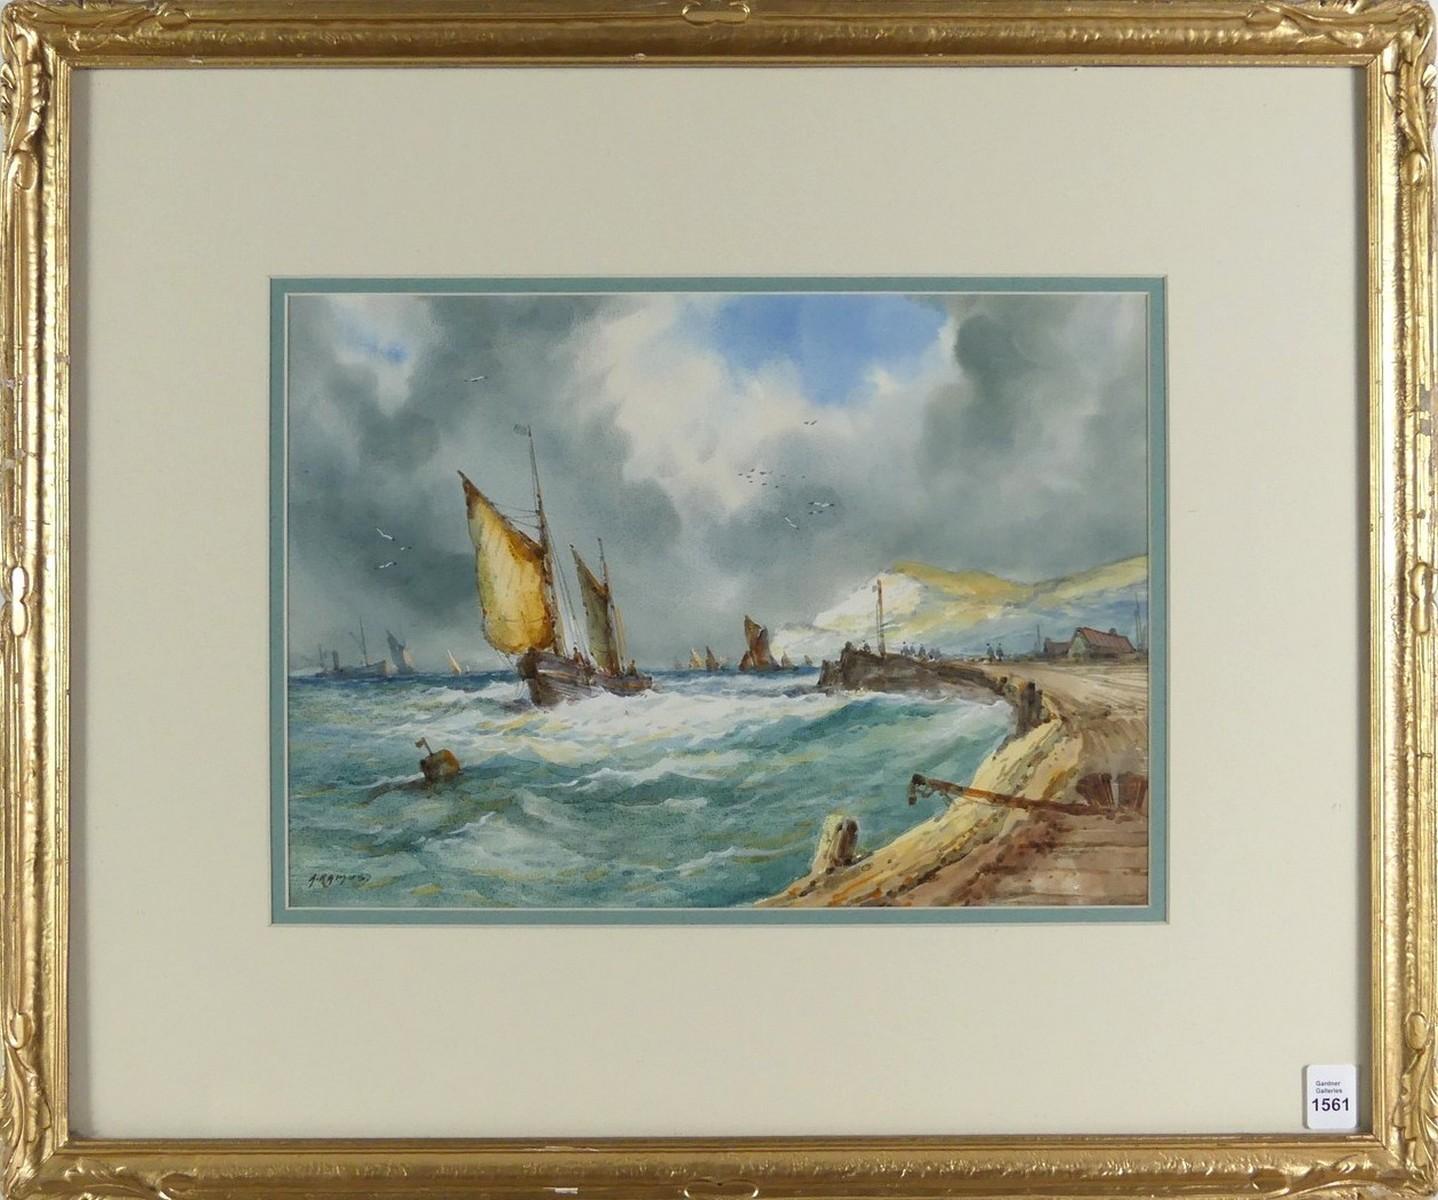 IMPRESSIVE DIAMOND RING